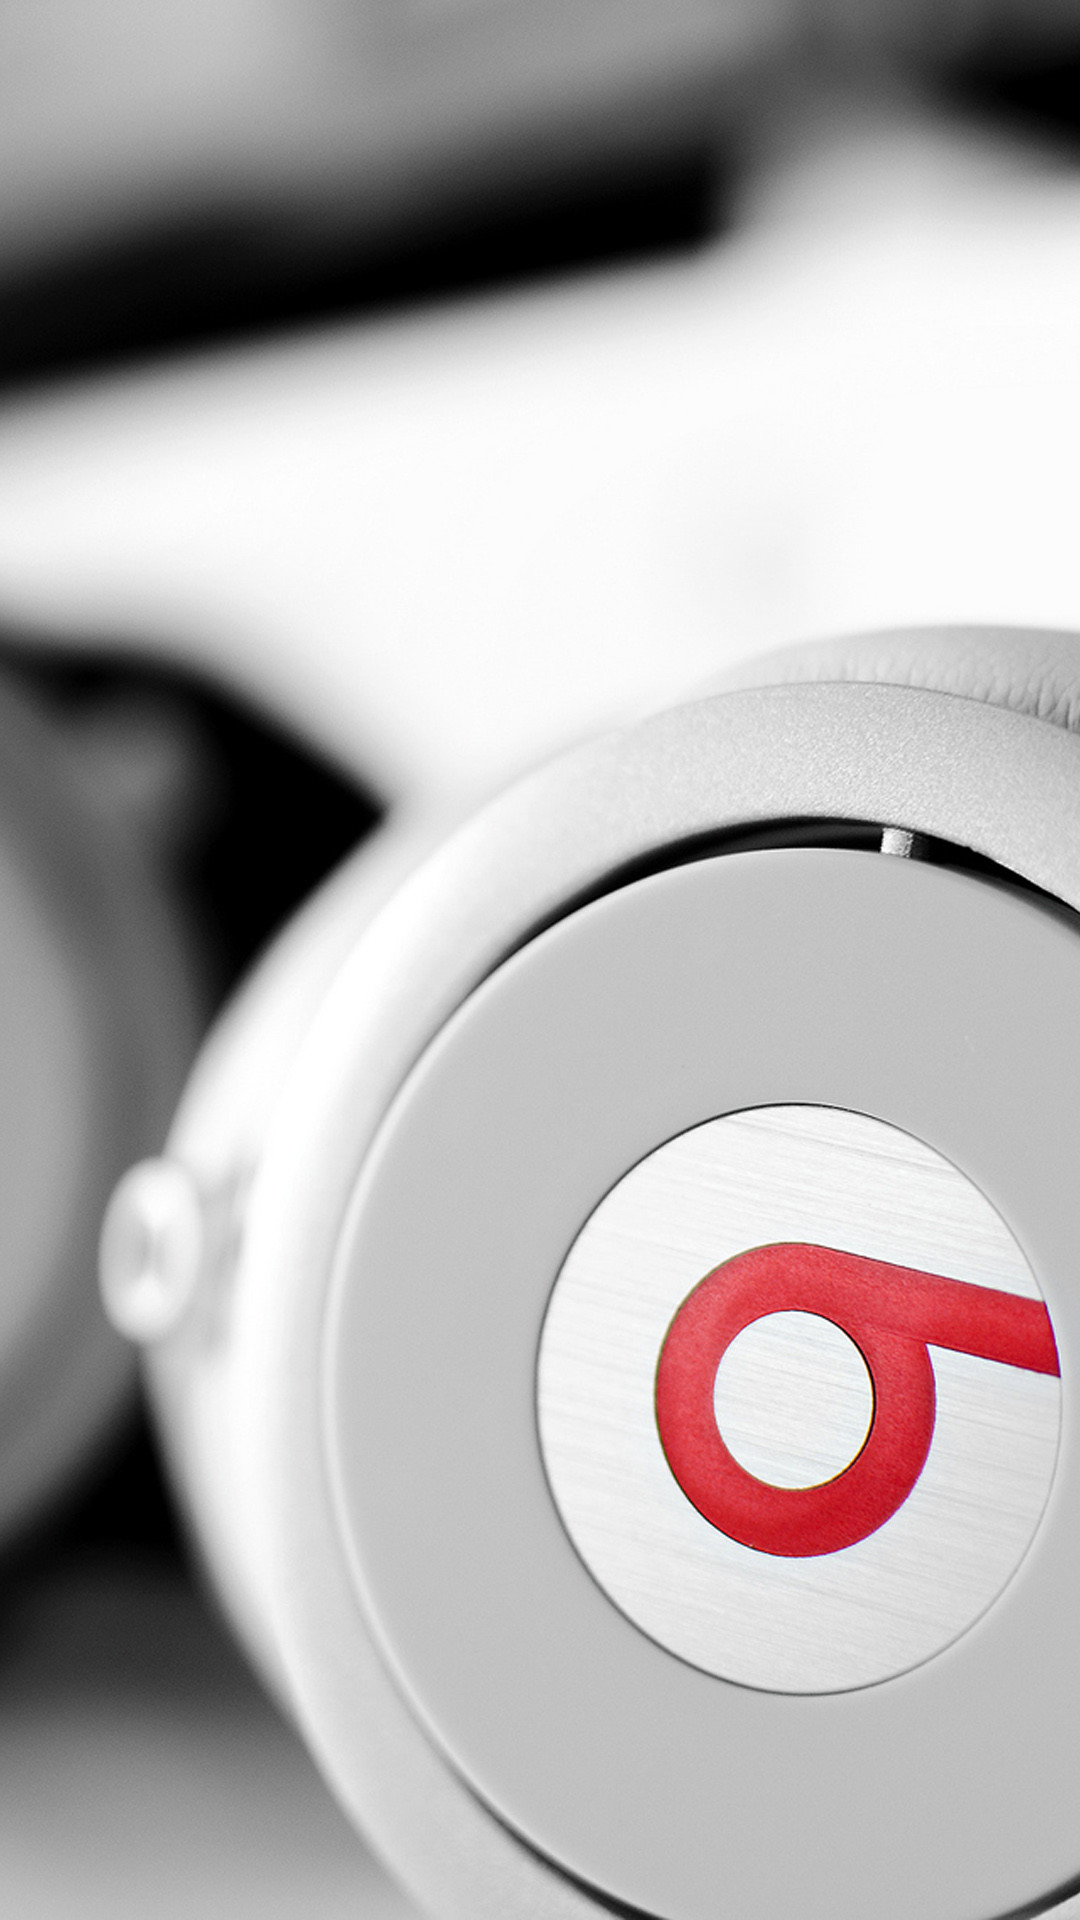 White Beats Headphones iPhone 6 Plus HD Wallpaper – Top 10 Brands iPhone  Wallpapers